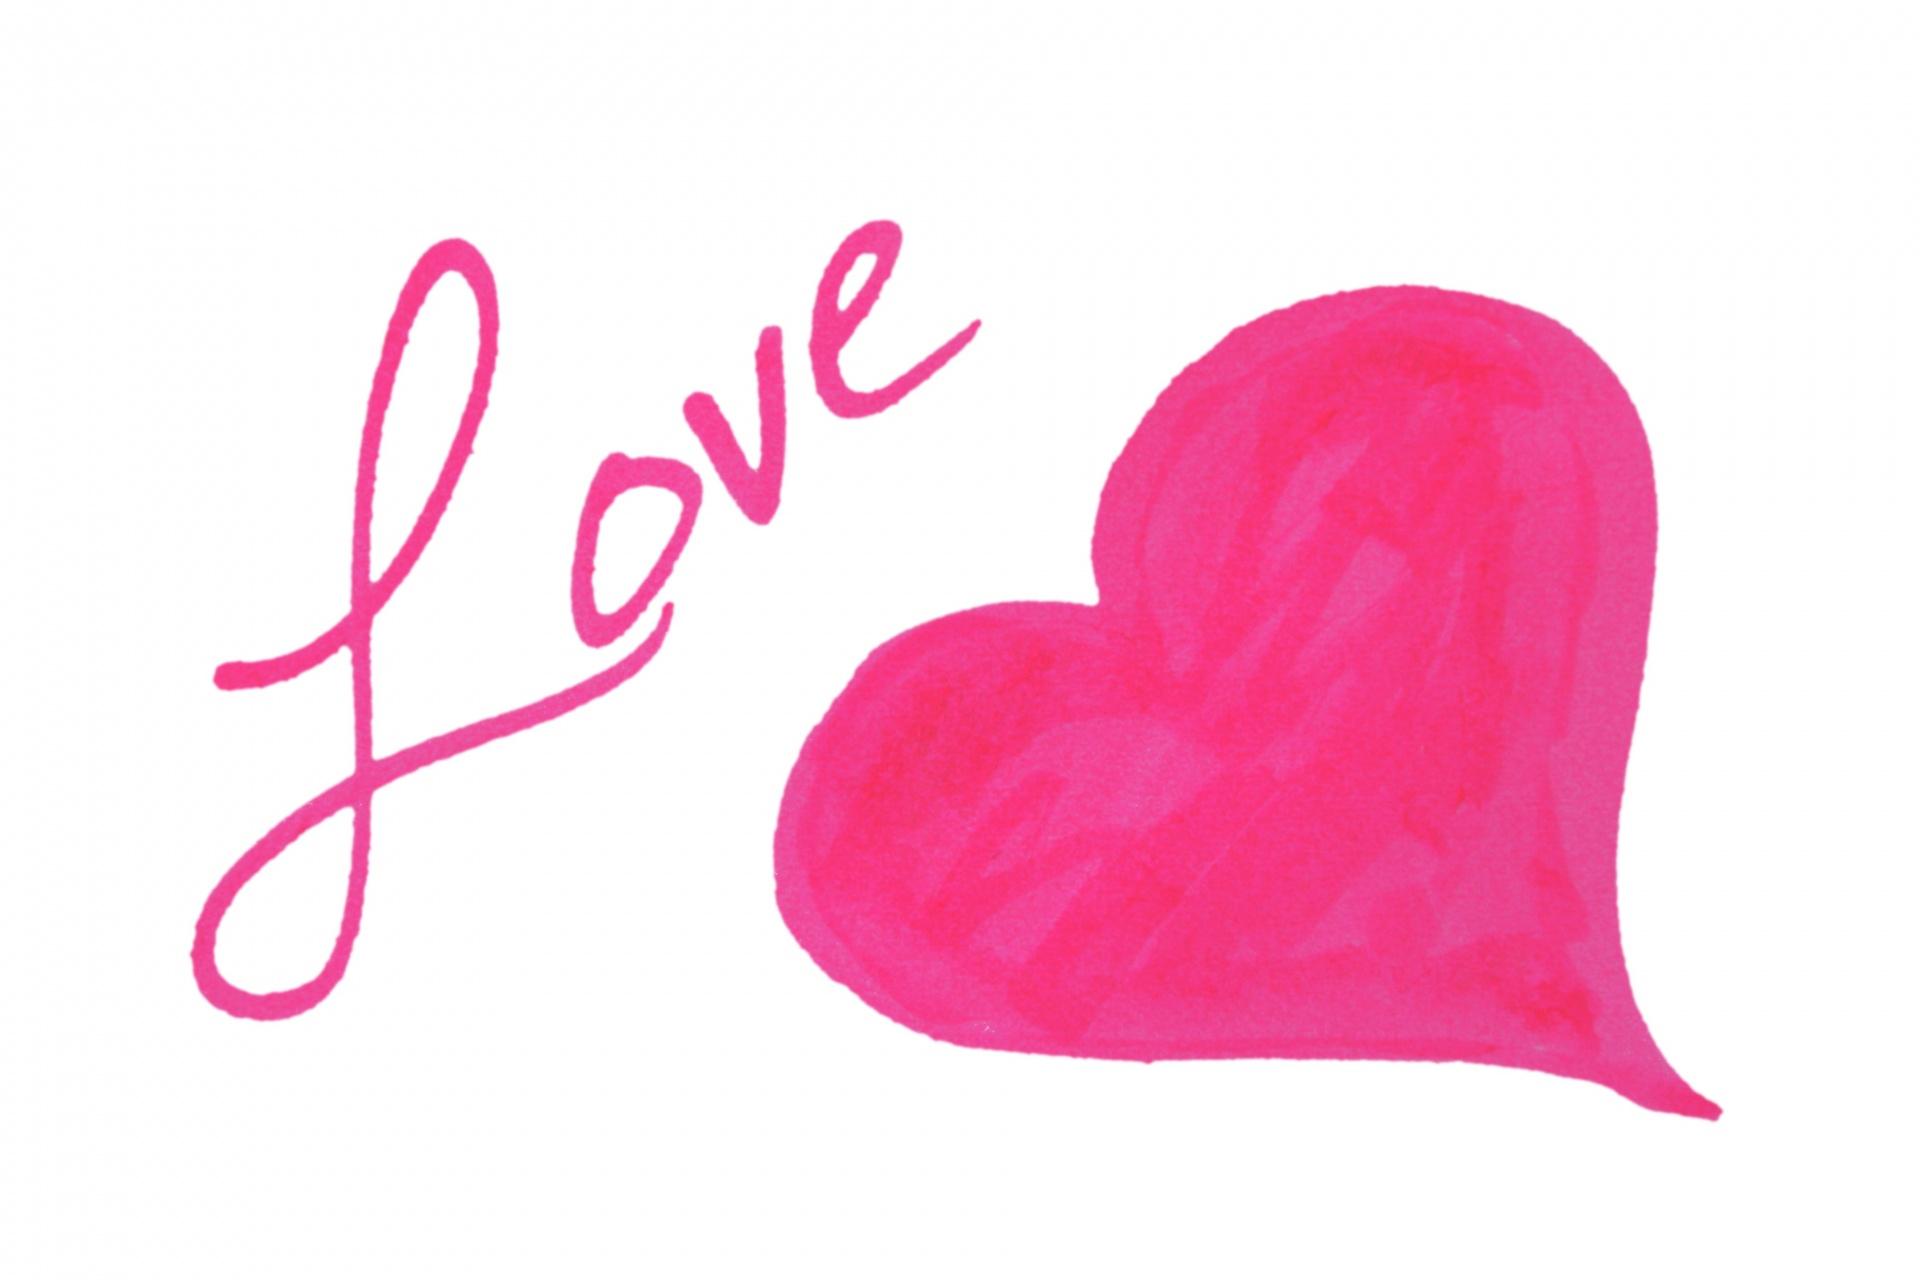 1920x1280 Pink Heart, Inscription, Love Free Stock Photo